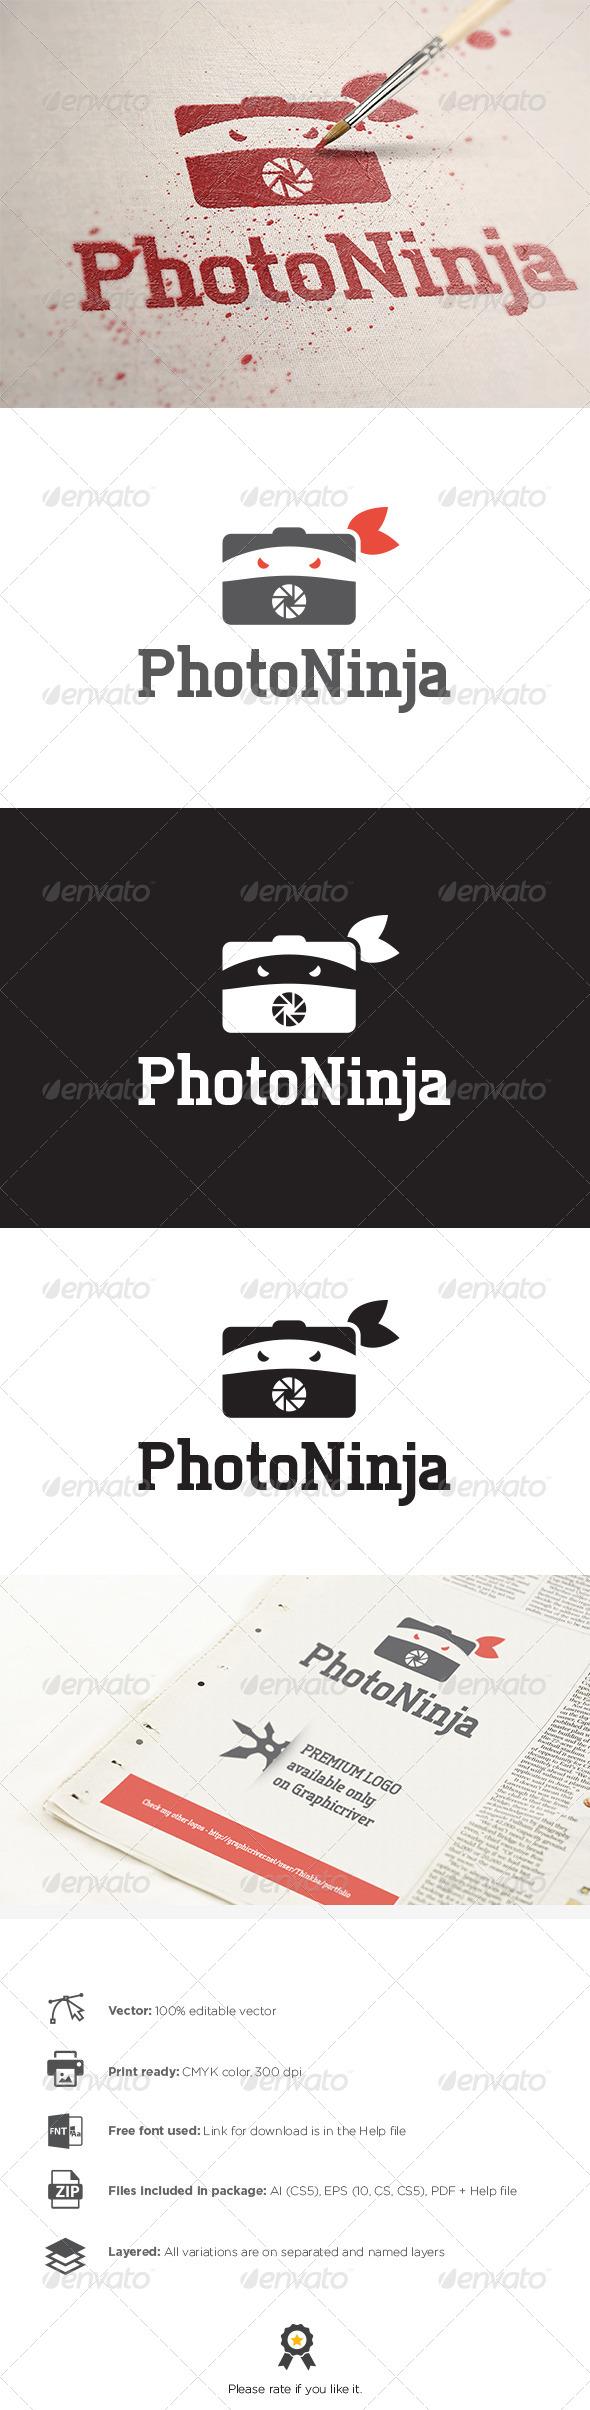 Photo Ninja Logo